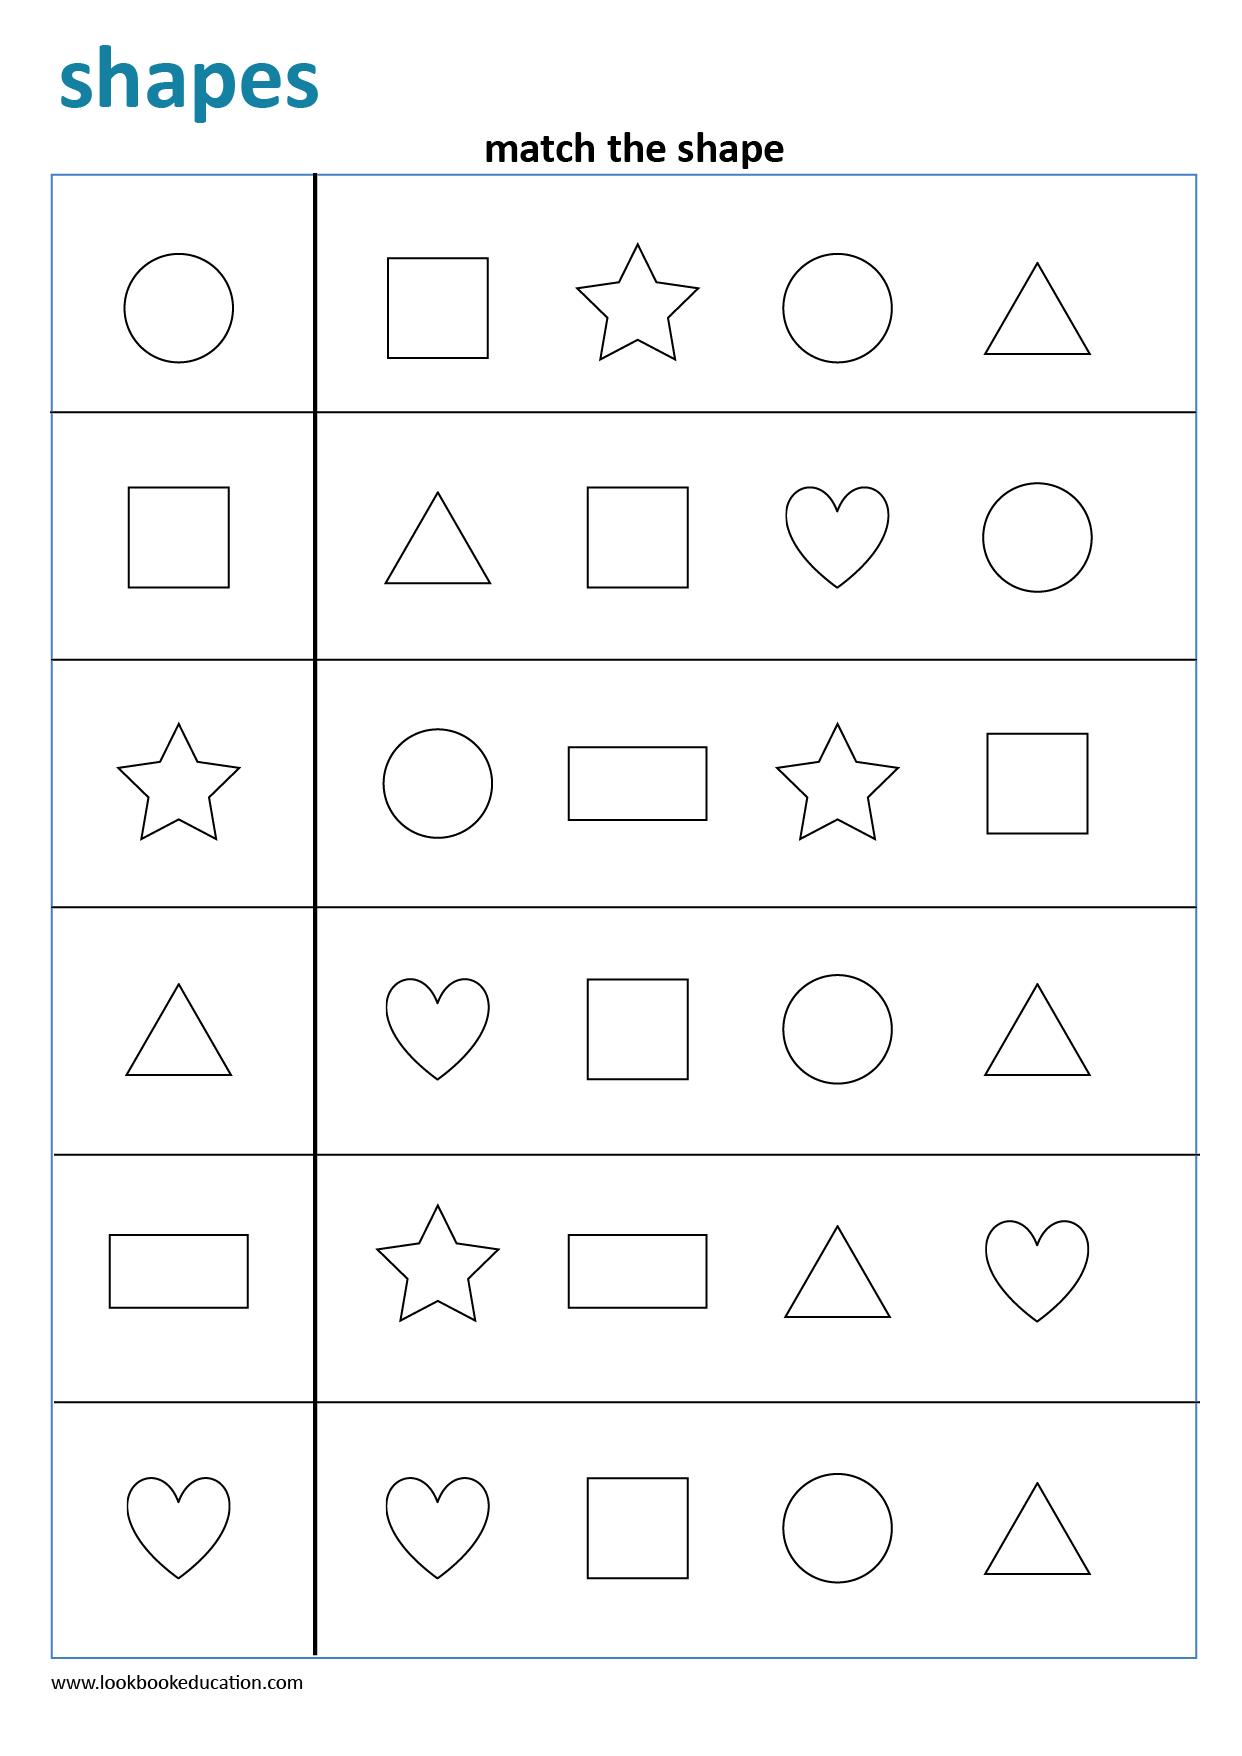 Worksheet Matching Shapes